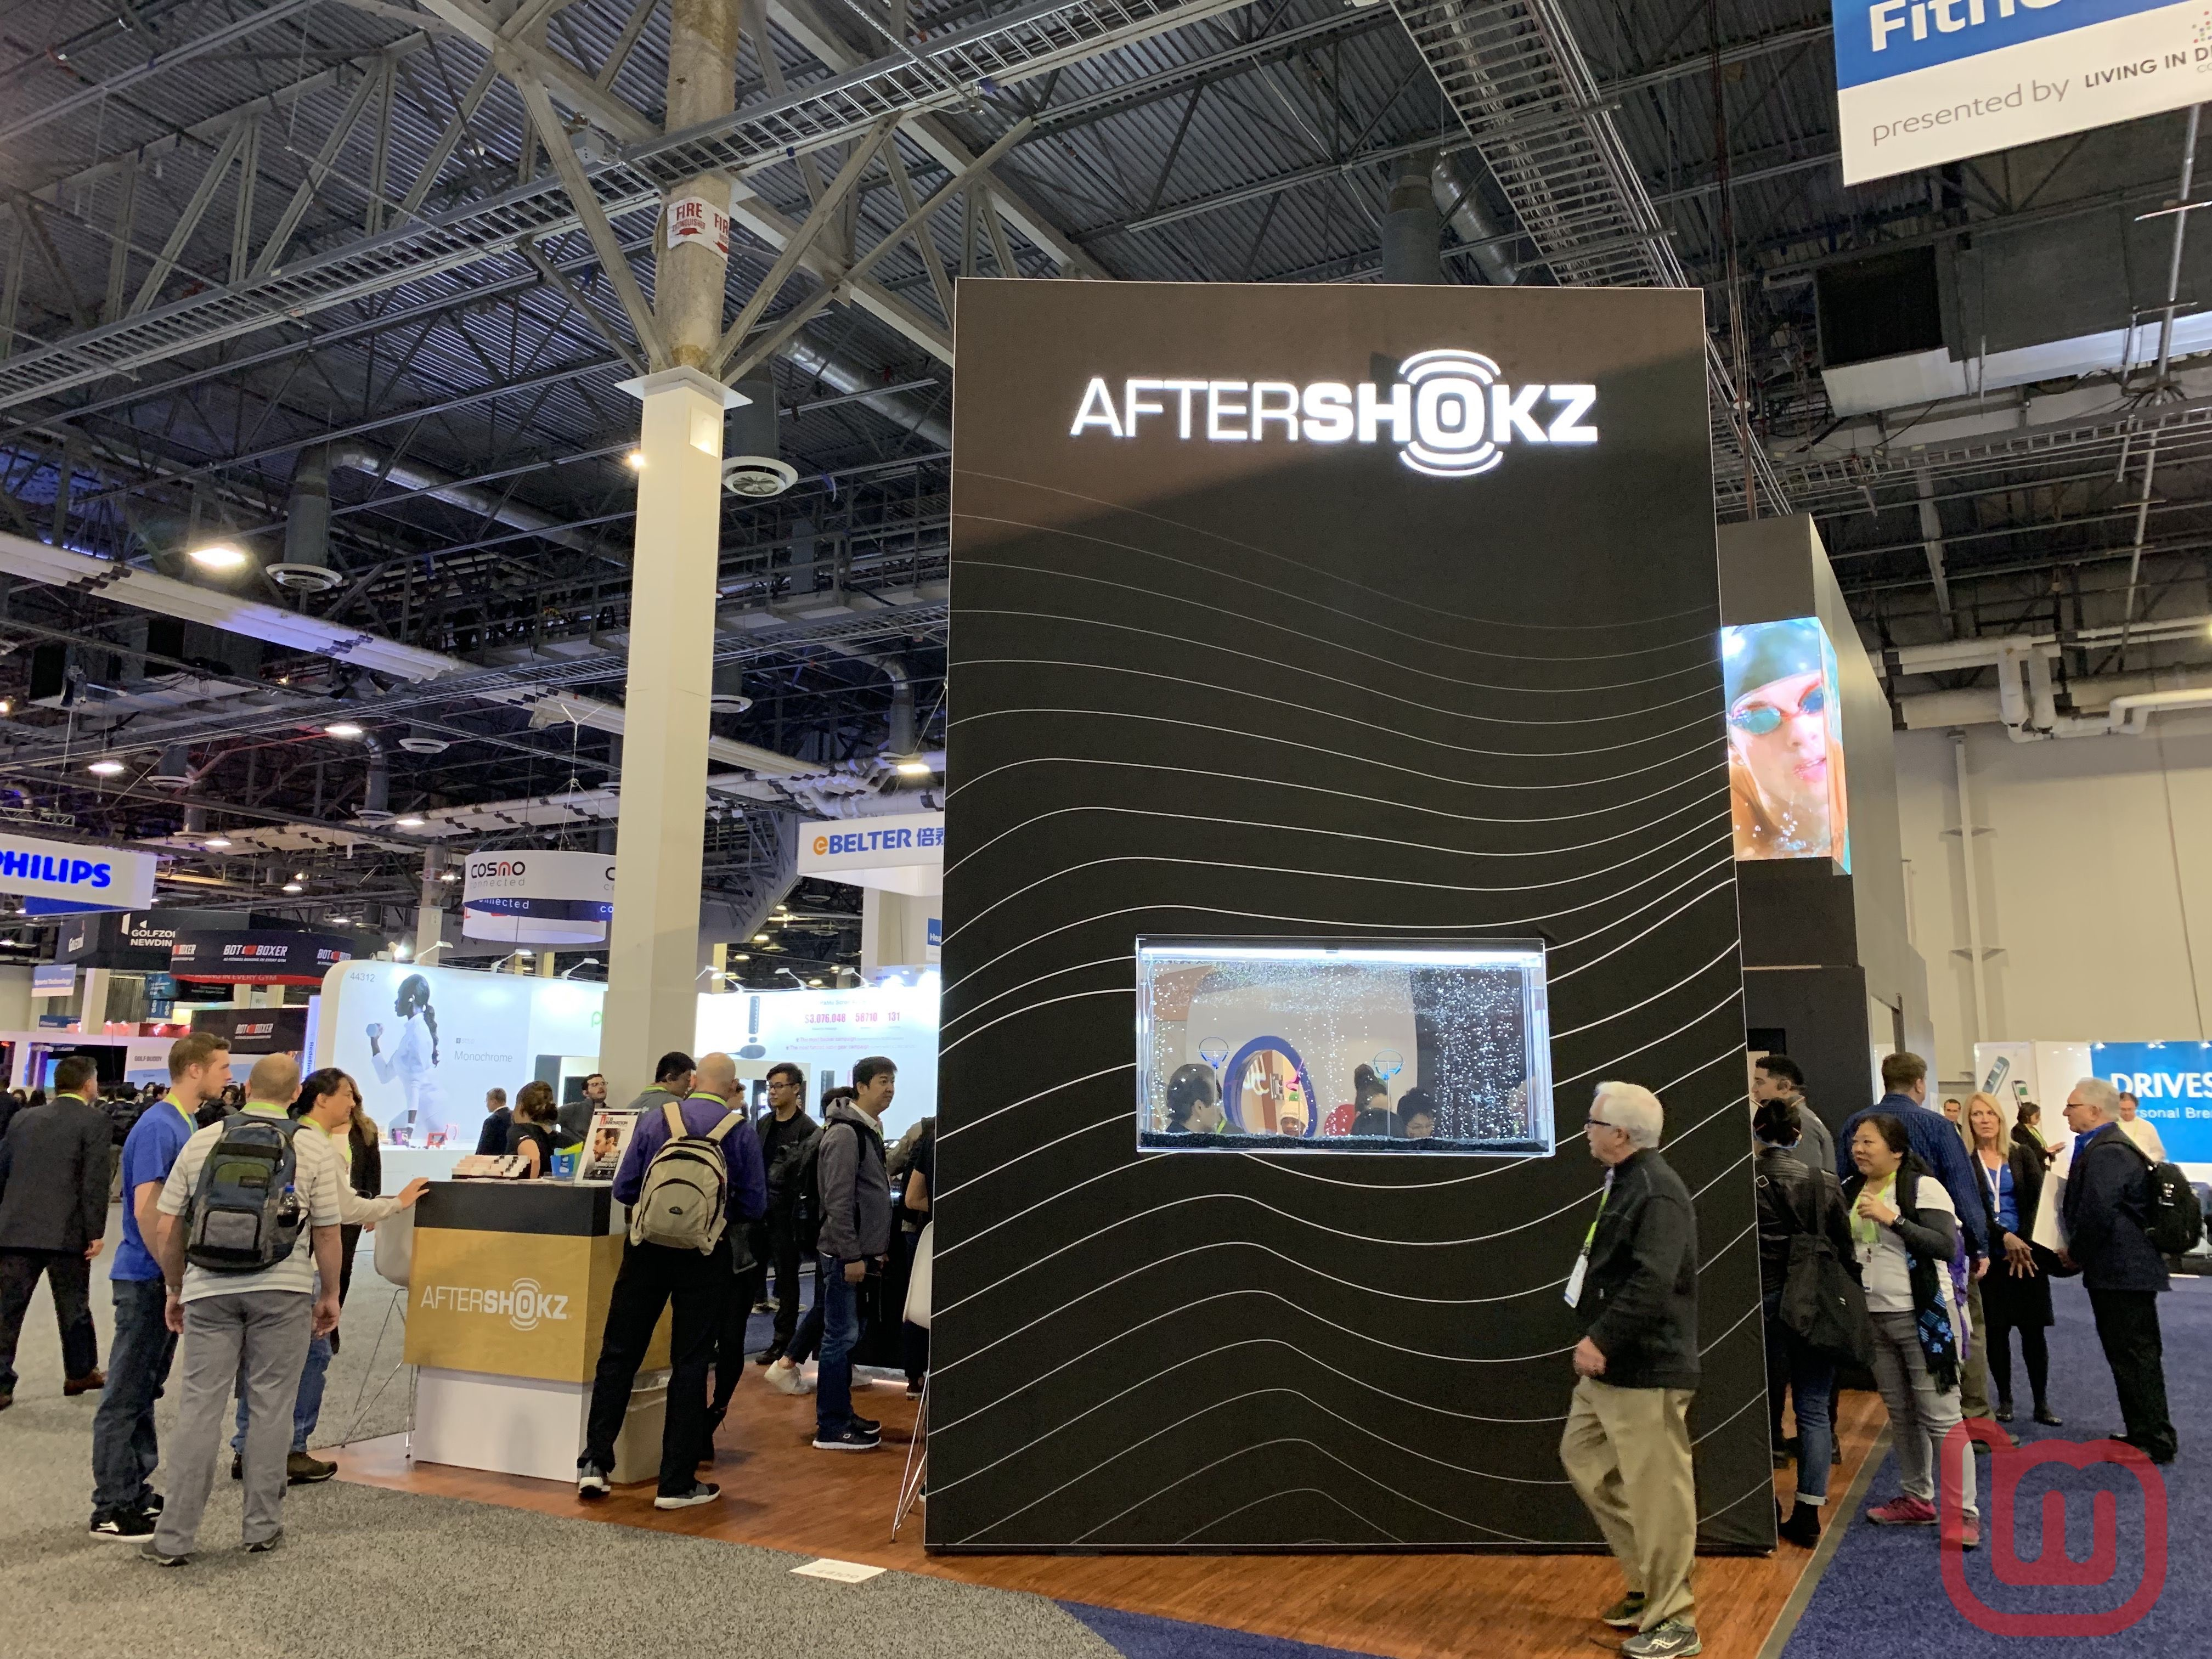 【CES 2019】Aftershokz、サングラス型骨伝導ヘッドホン「Optishokz」などの新製品を展示